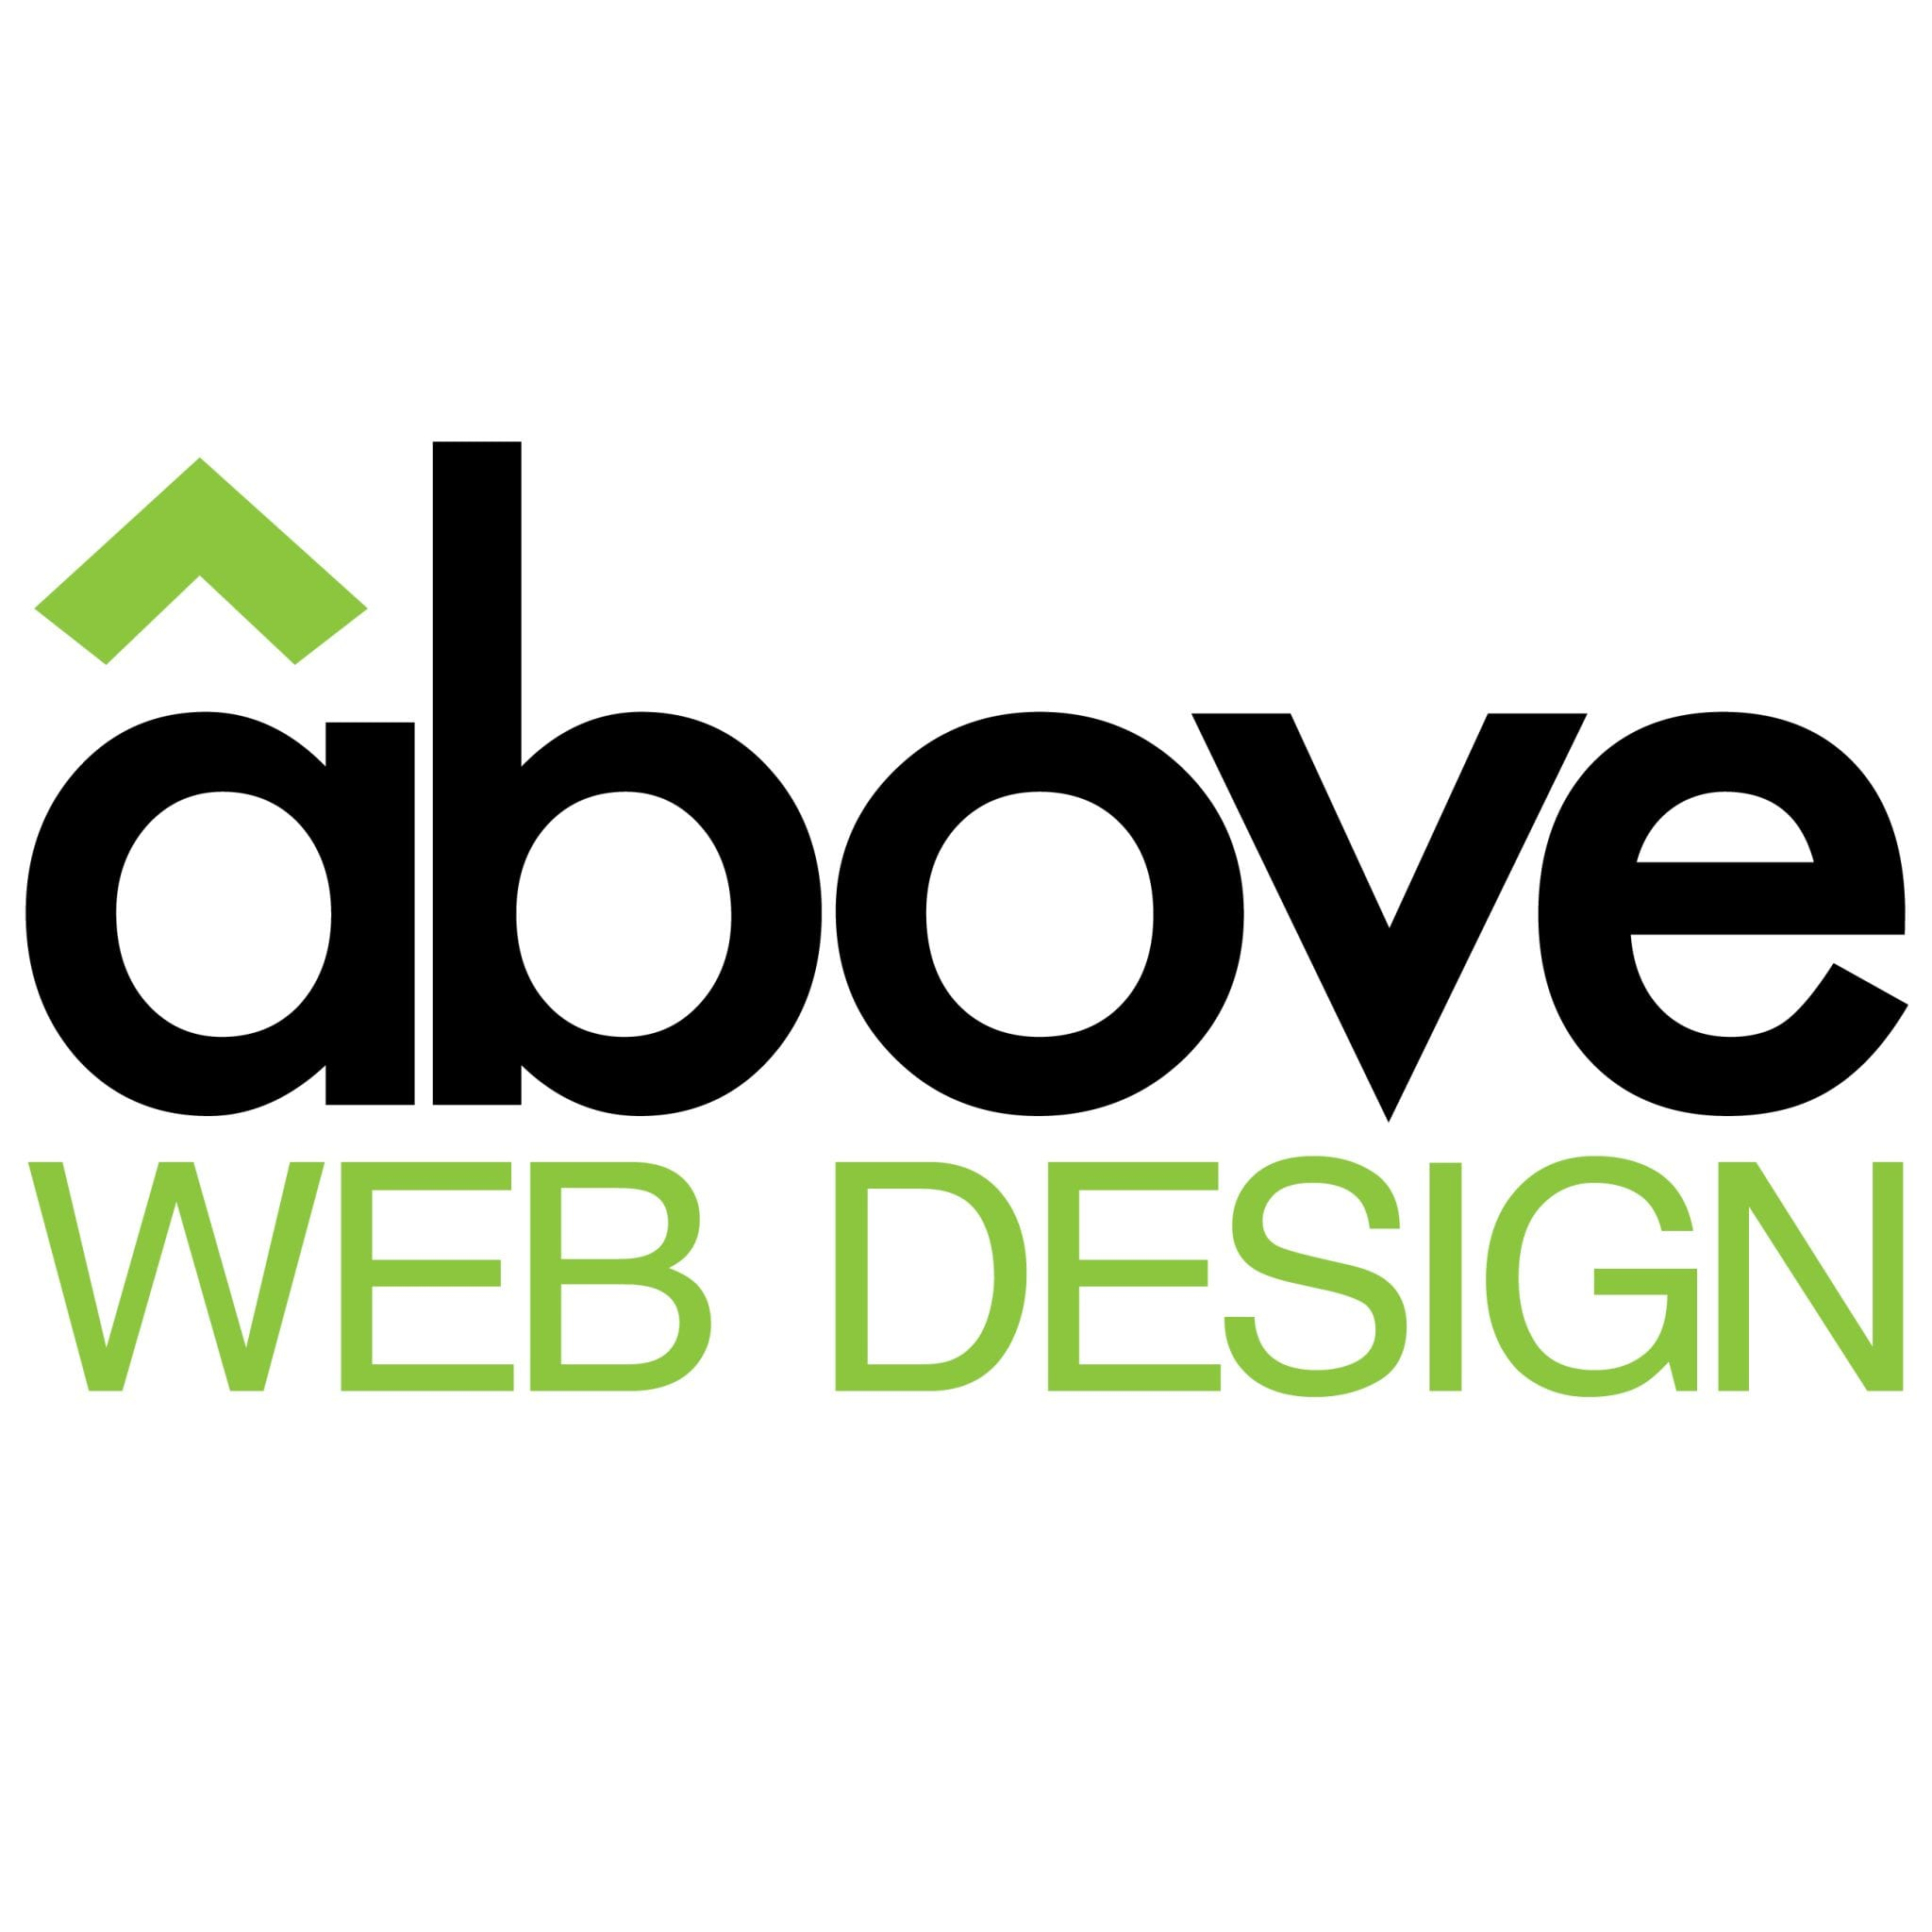 Fort Lauderdale Web Design And Seo Above Web Design